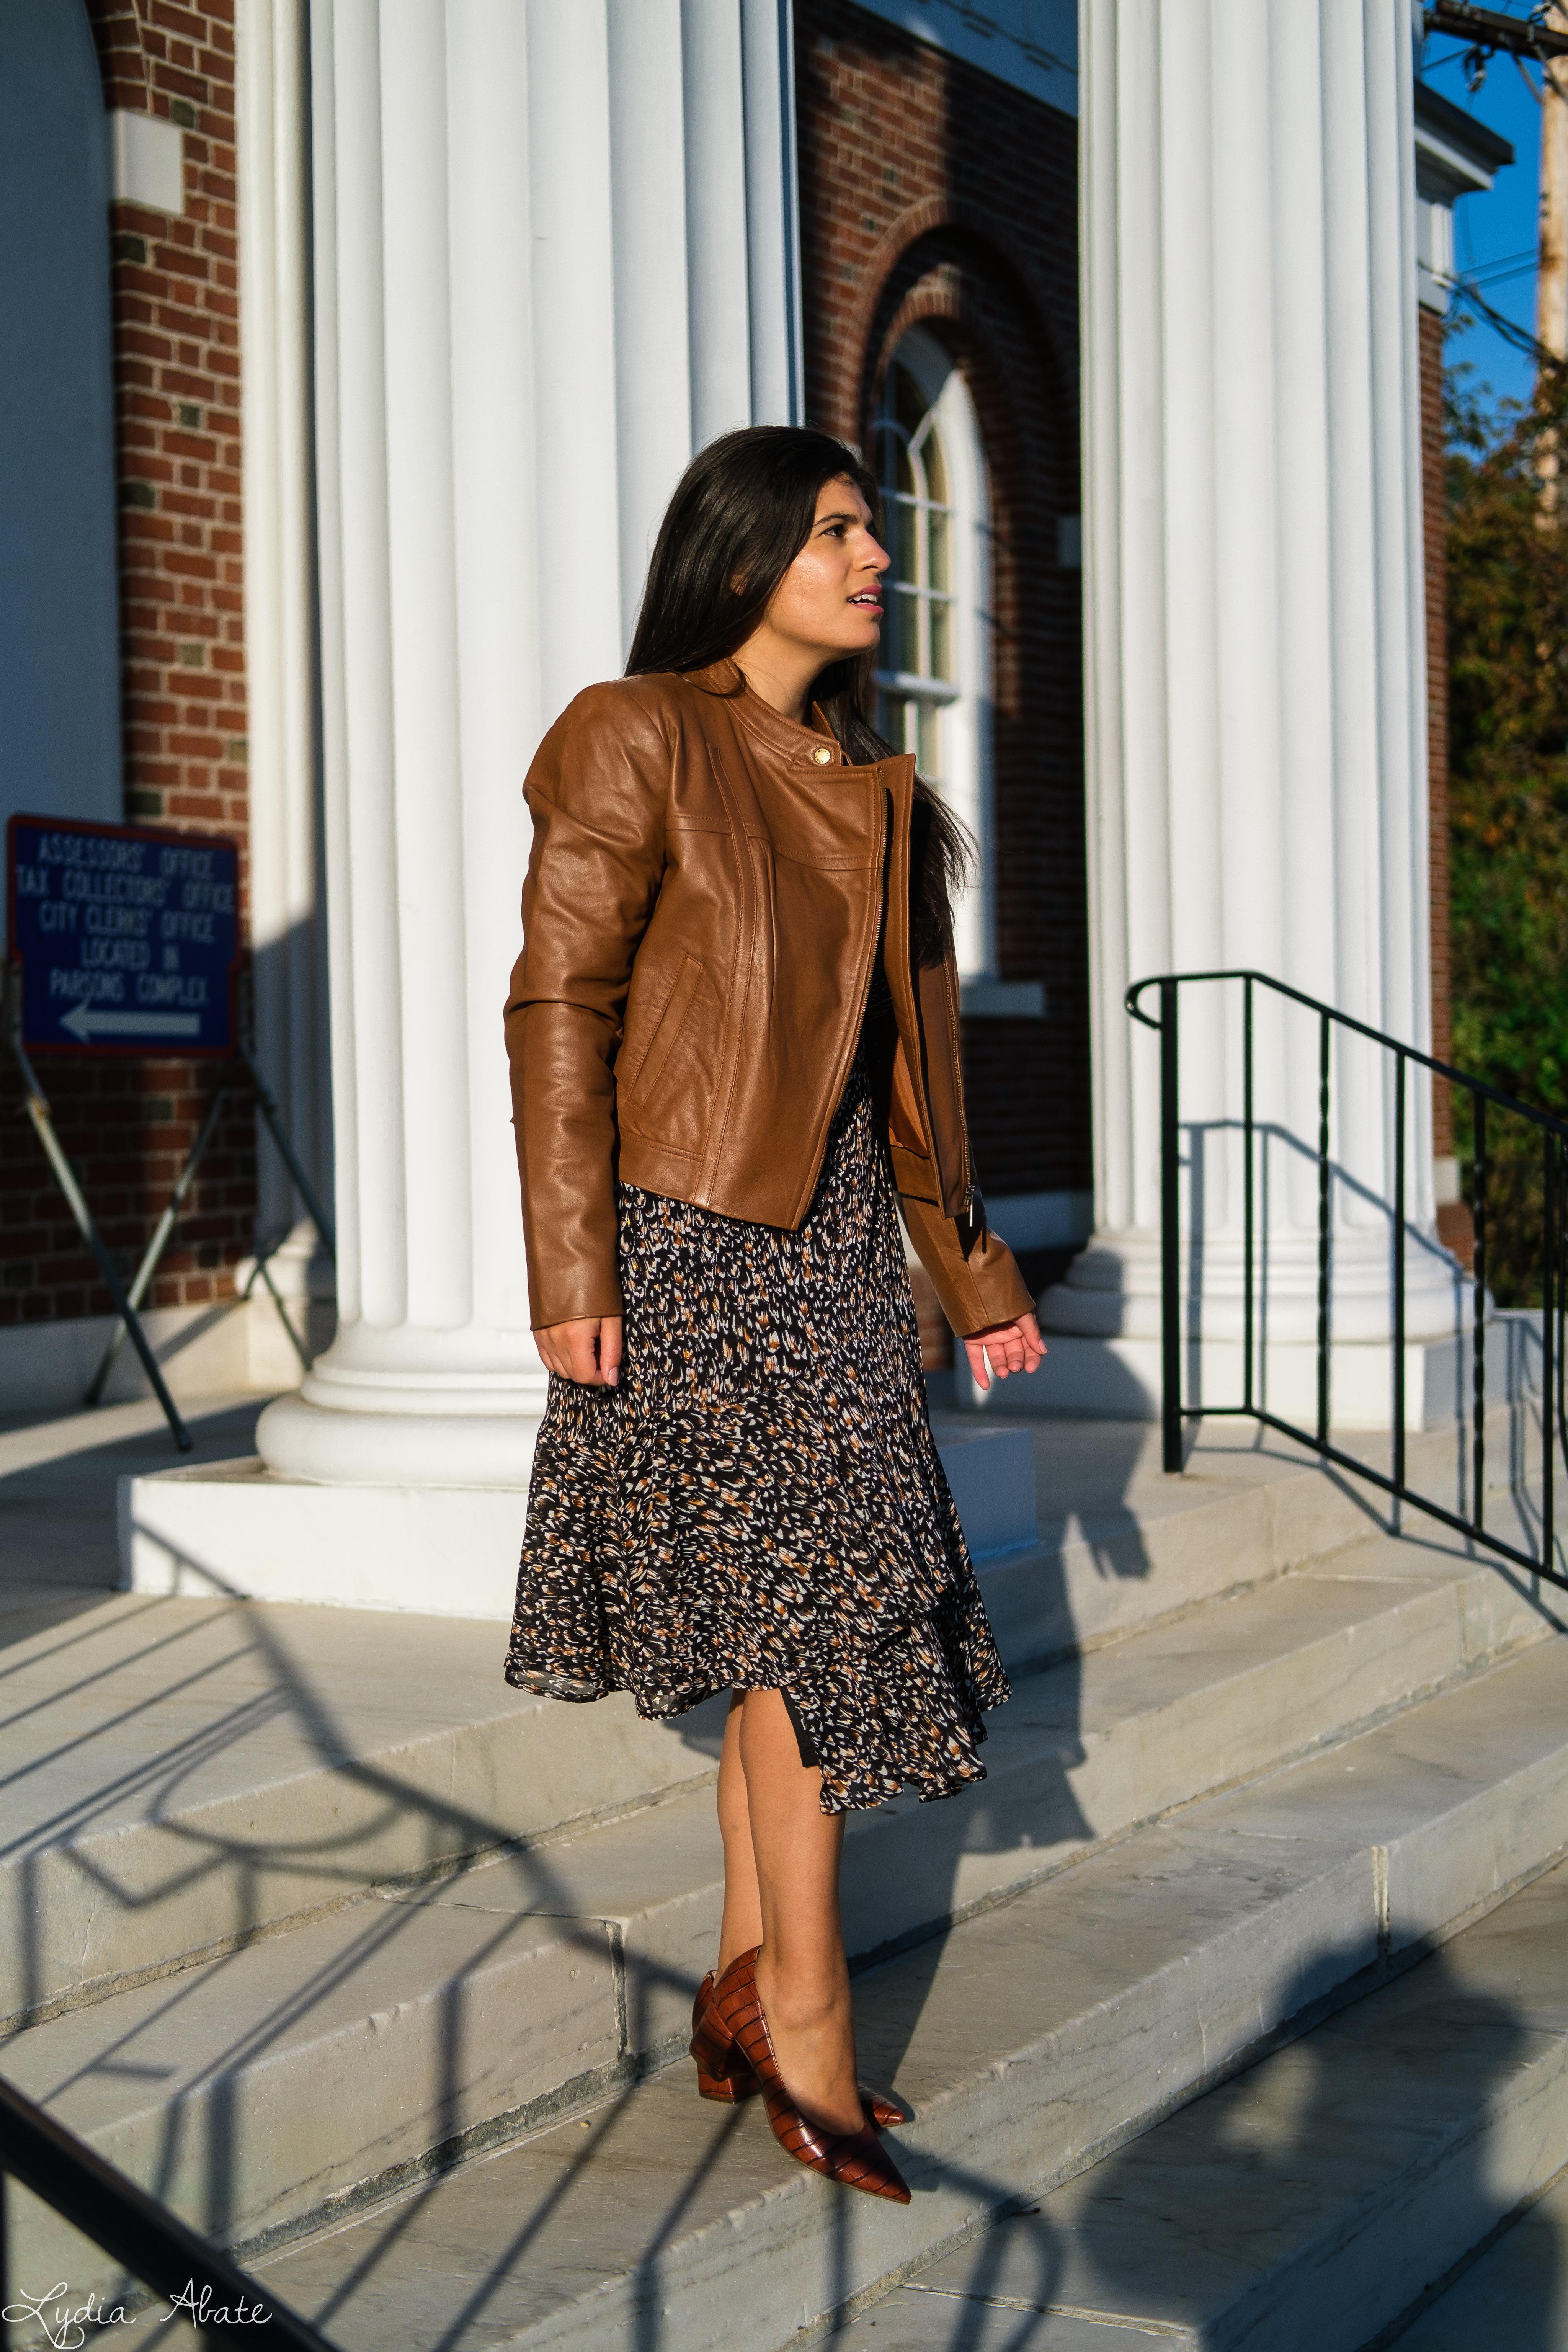 long sleeve wrap dress, brown leather jacket, croc pumps-4.jpg